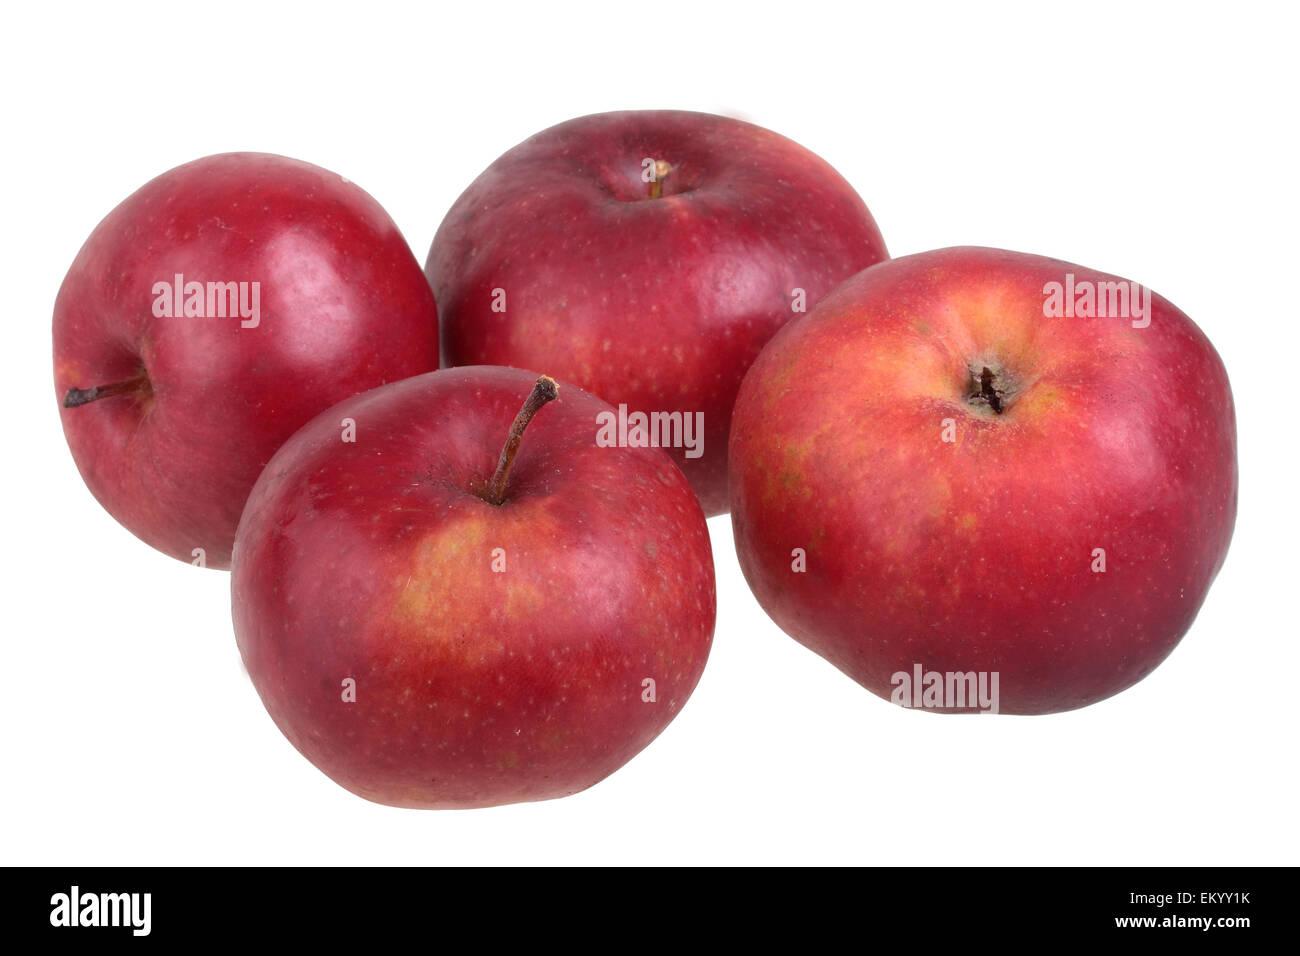 Apple variety Danzig Kant - Stock Image